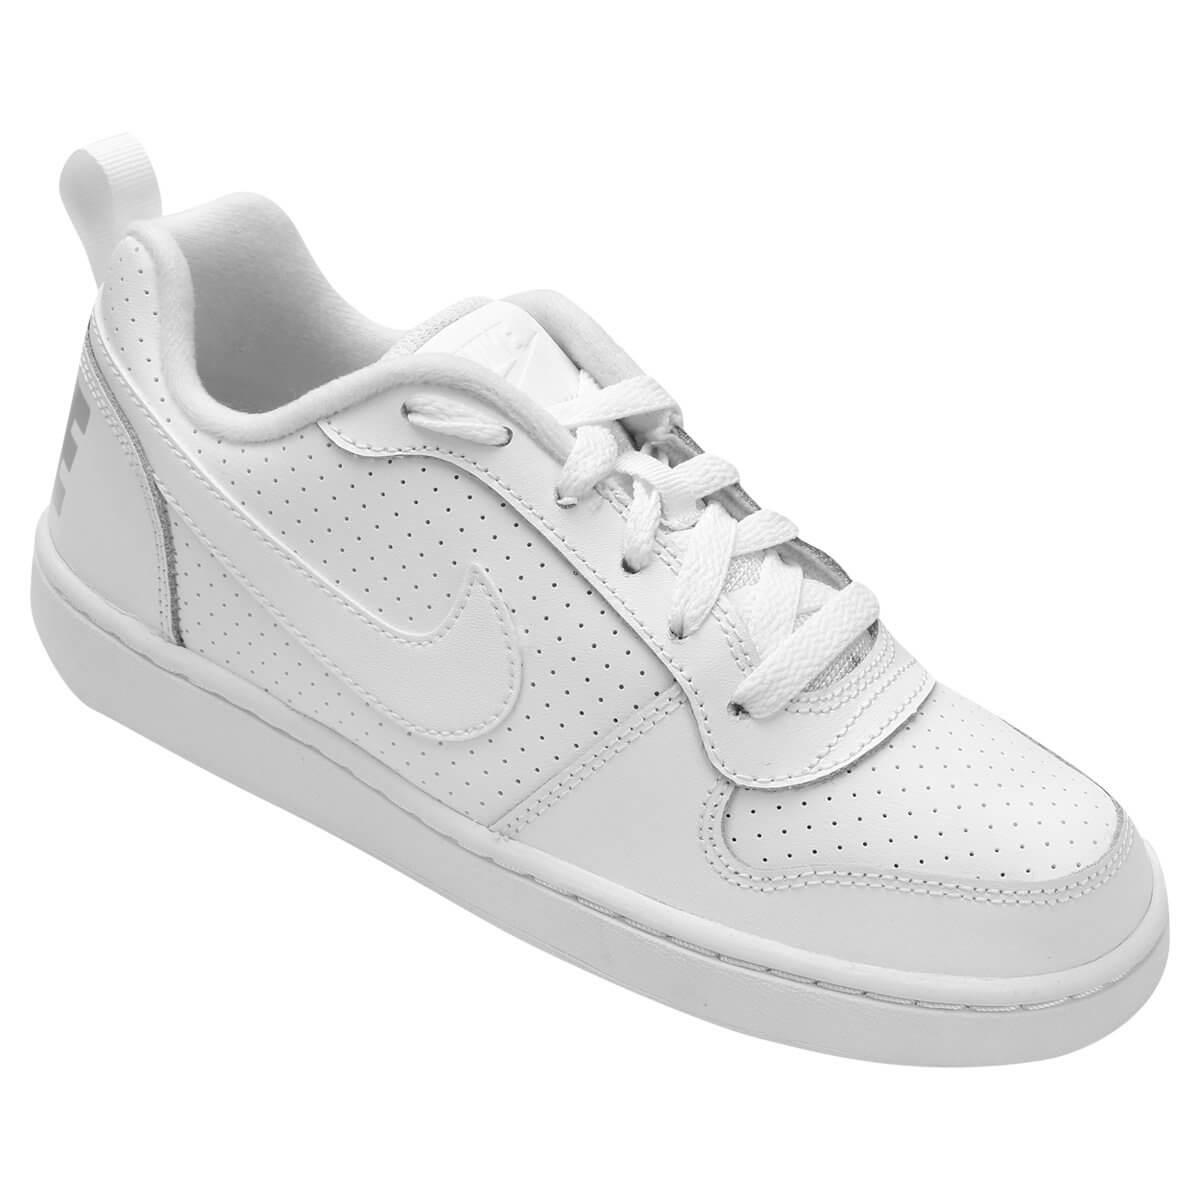 8199bc8547f Tênis Infantil Nike Court Borough Low Masculino - Decker Online